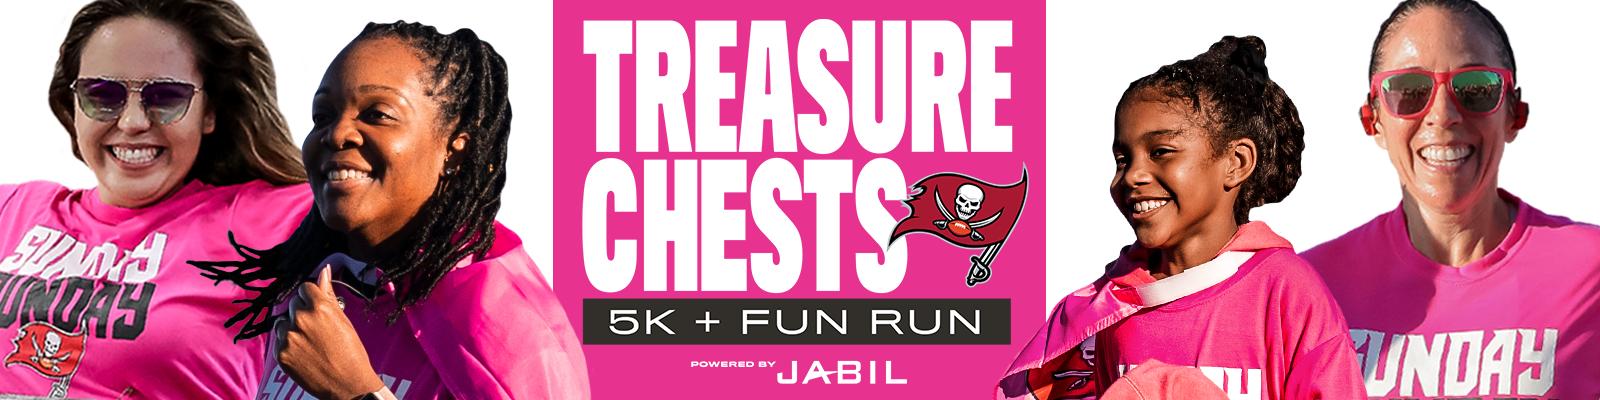 Treasure Chests 5K + Fun Run powered by Jabil